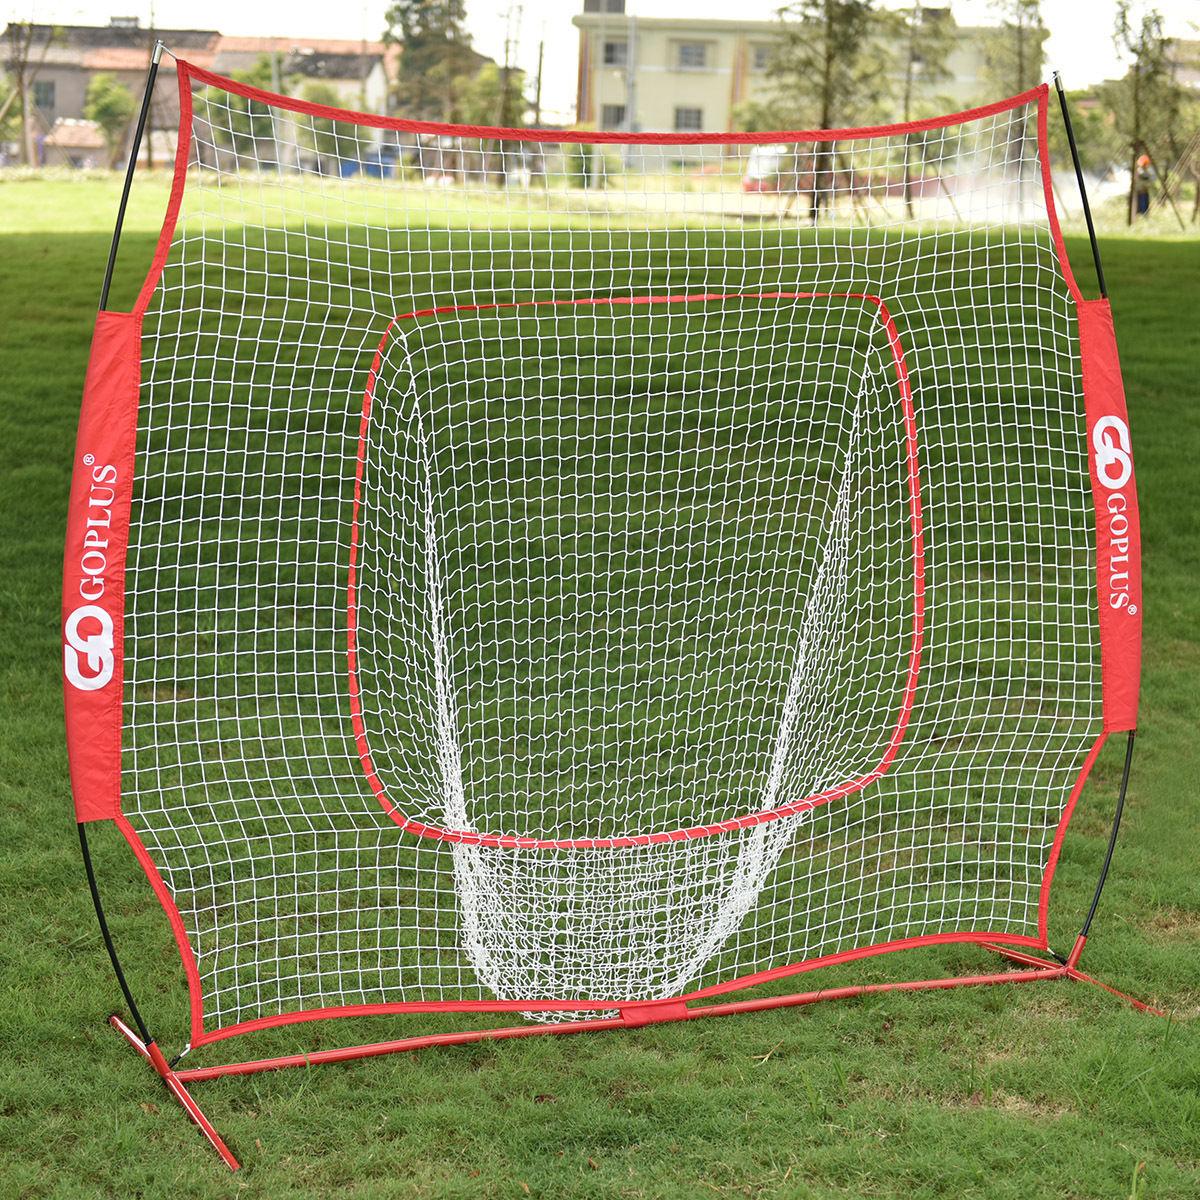 Costway 7x7' Baseball & Softball Practice Hitting Batting Training Net with Bow Frame, Red Bag